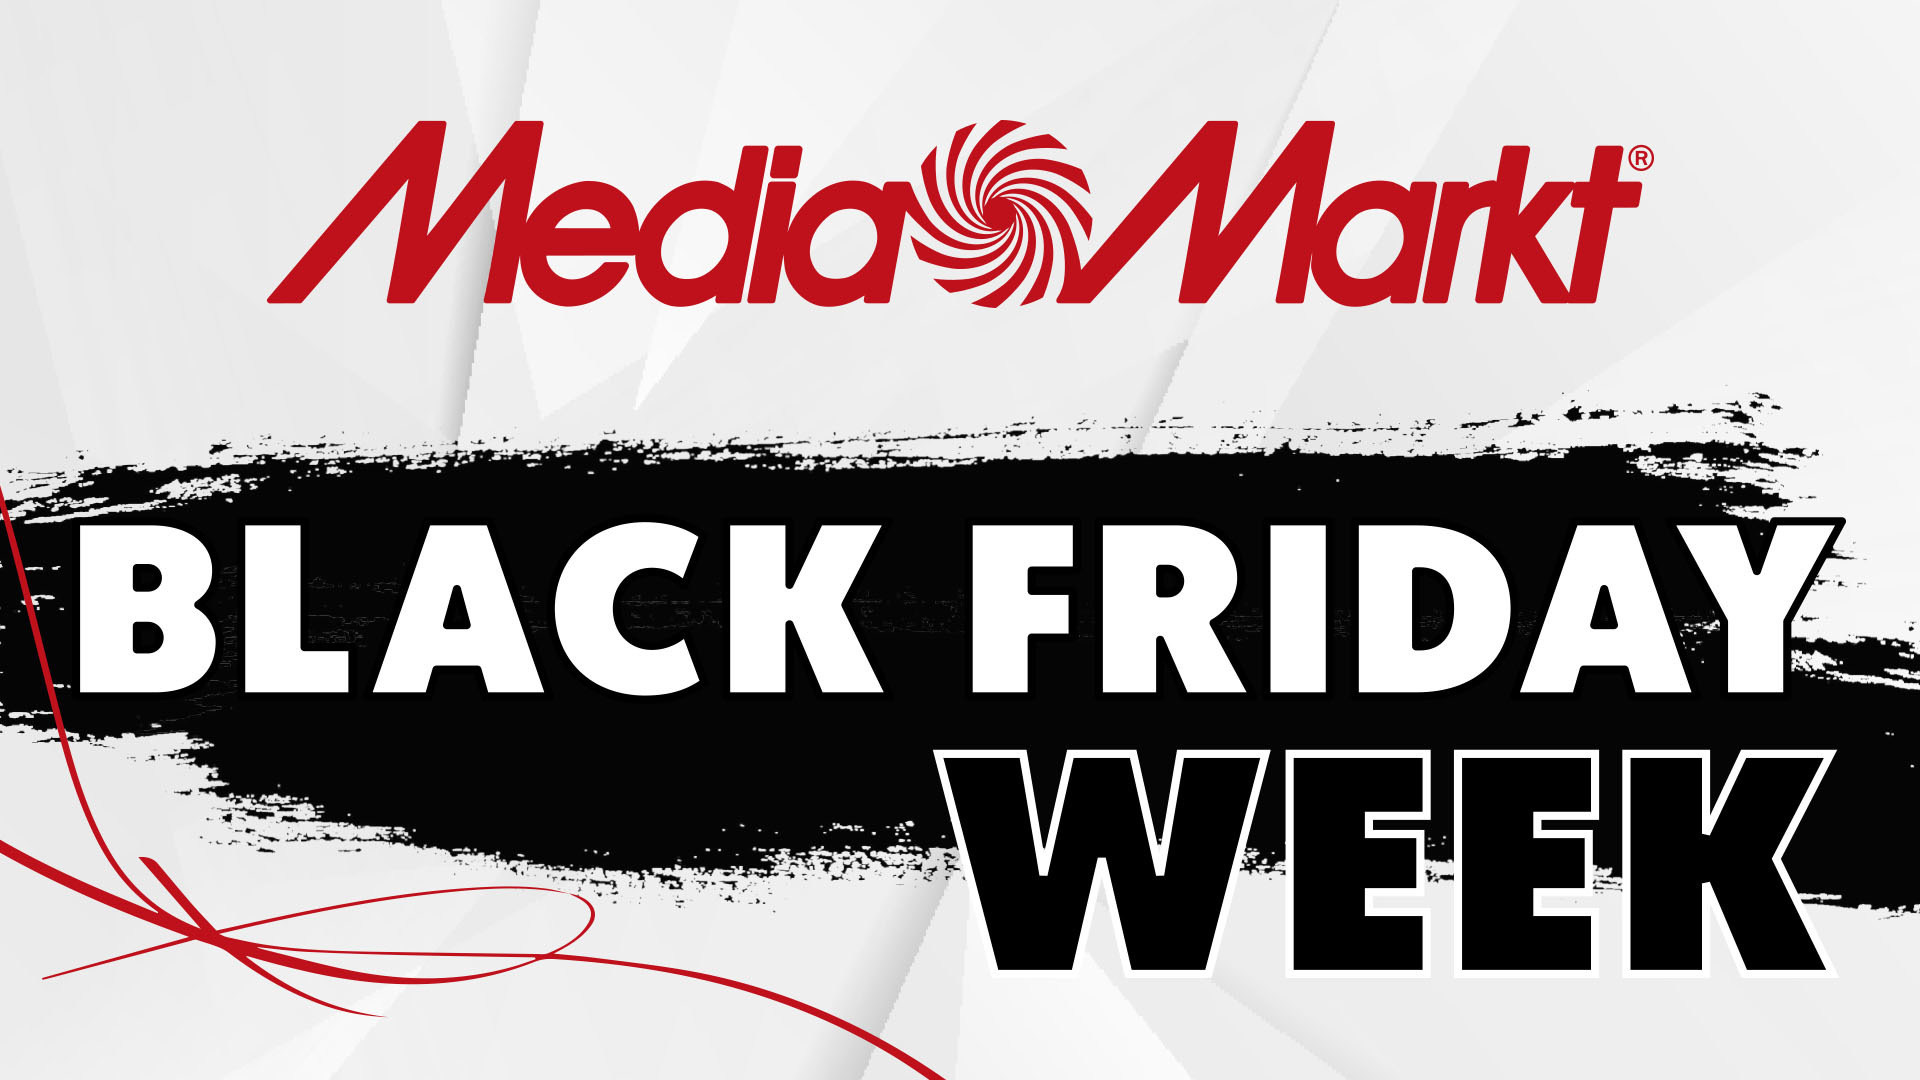 Media Markt, Mediamarkt, Black Friday Woche, Black Friday Week